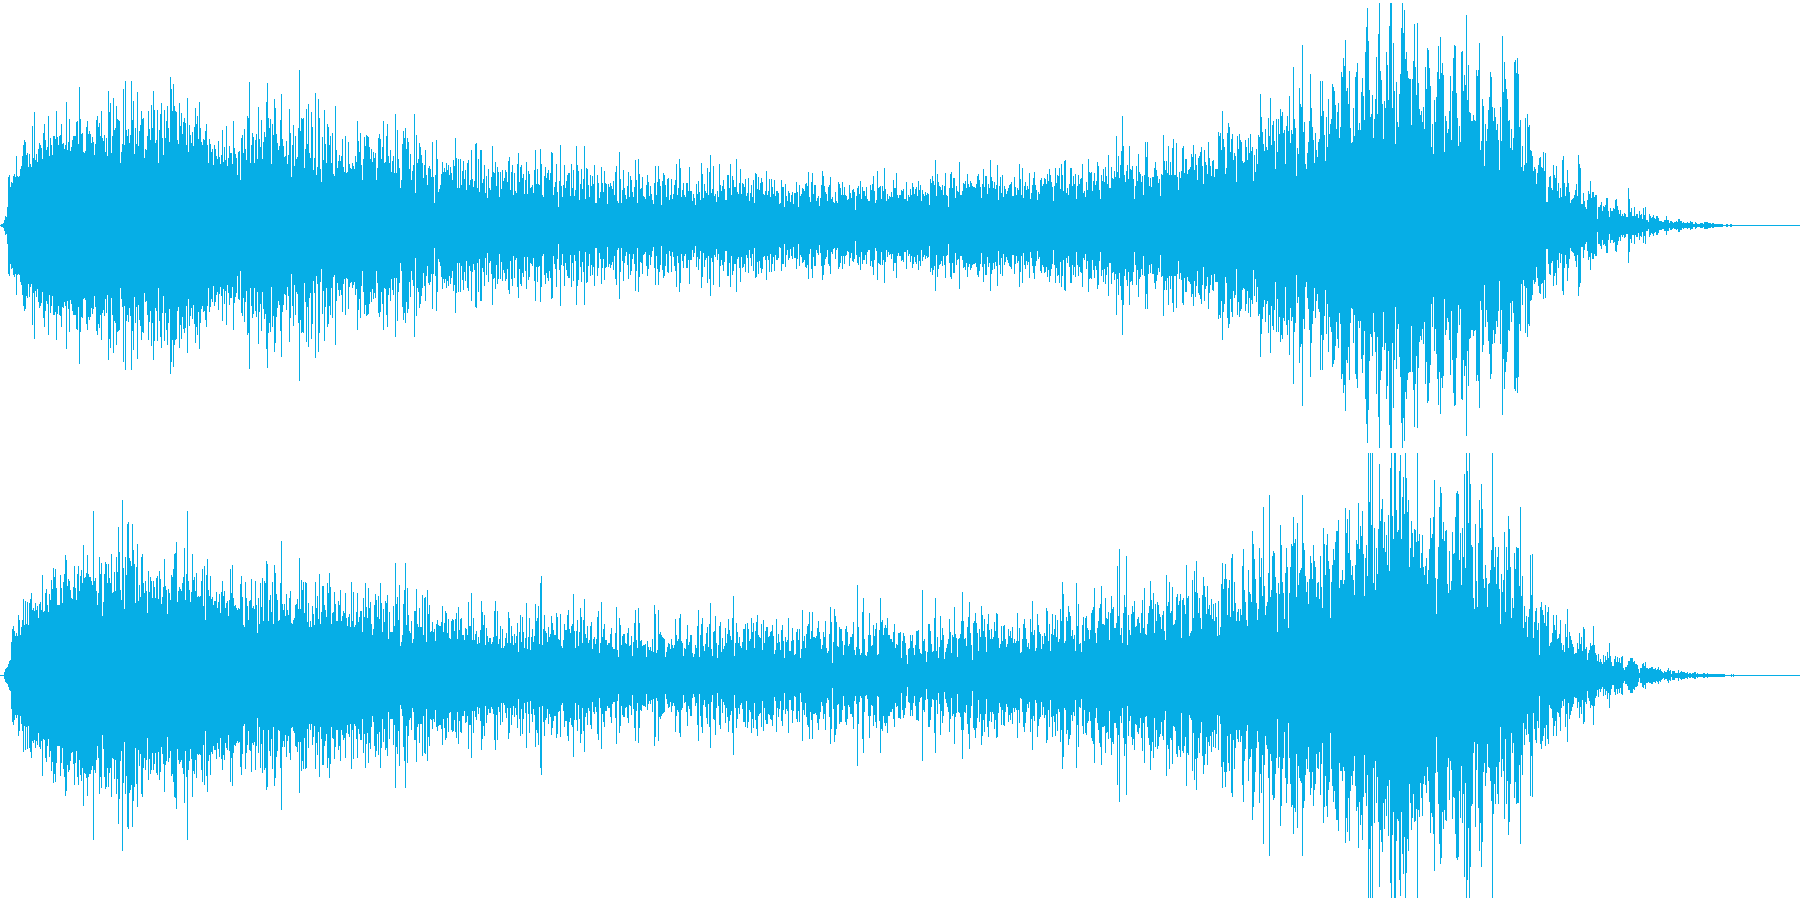 SF映画の効果音の再生済みの波形